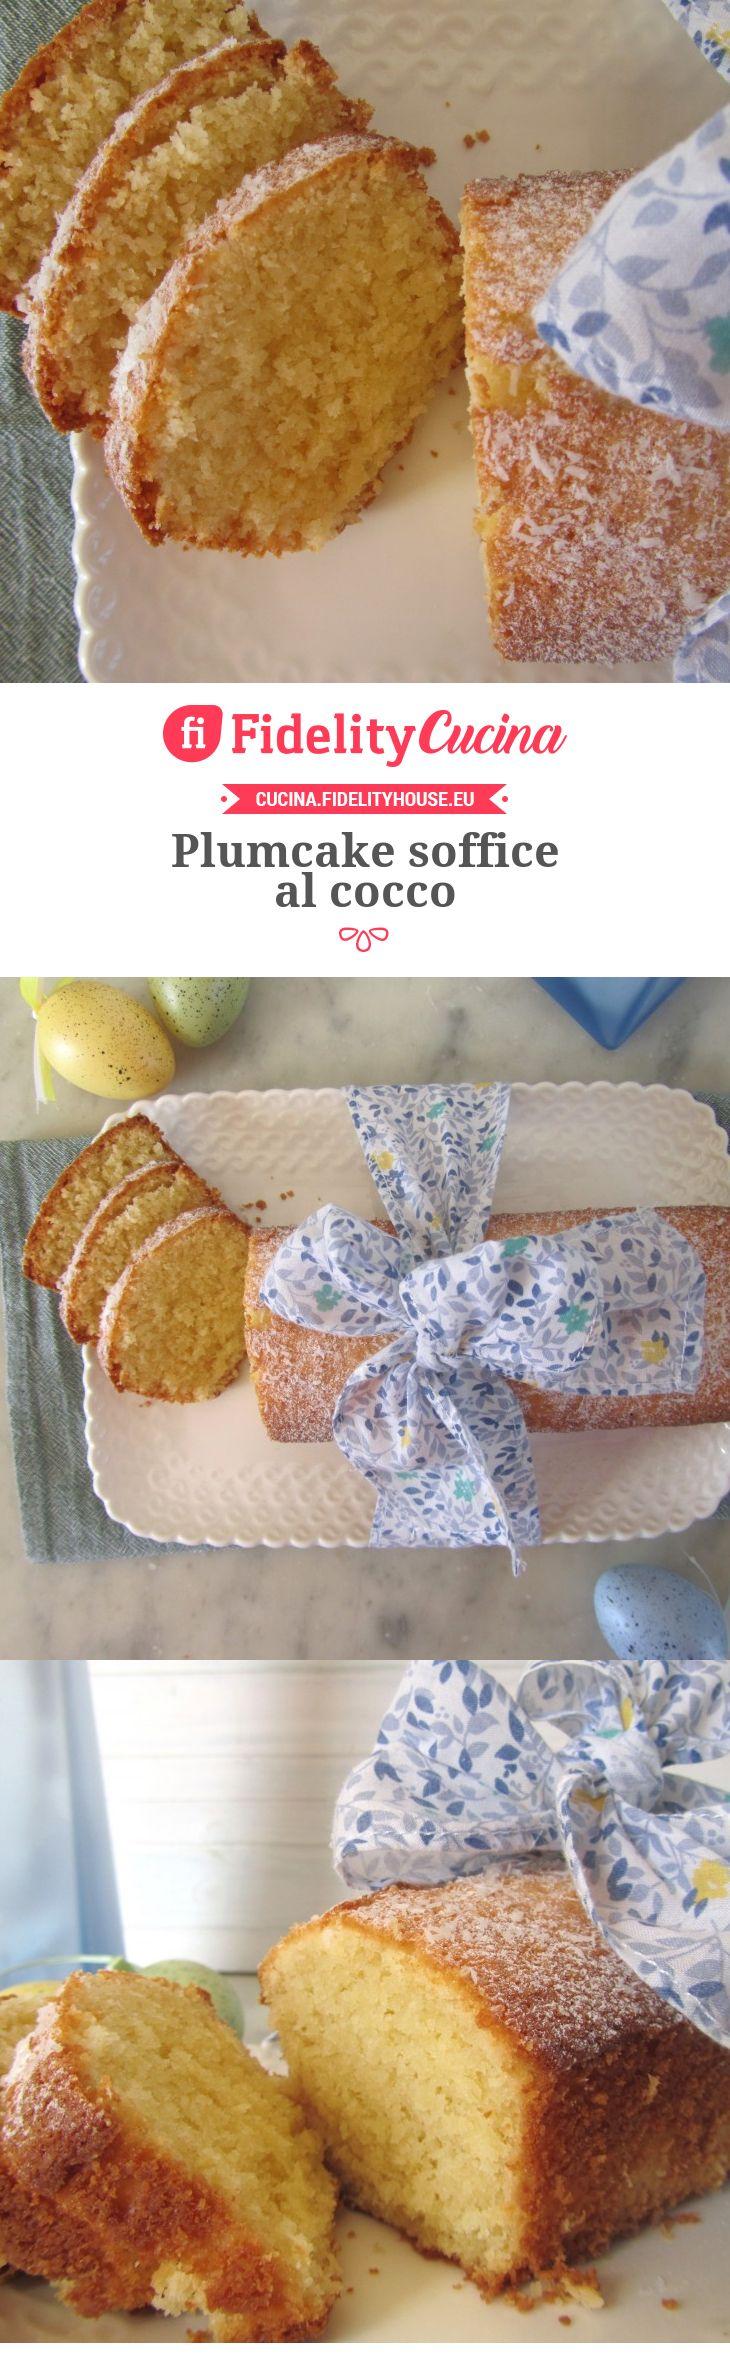 Plumcake soffice al cocco